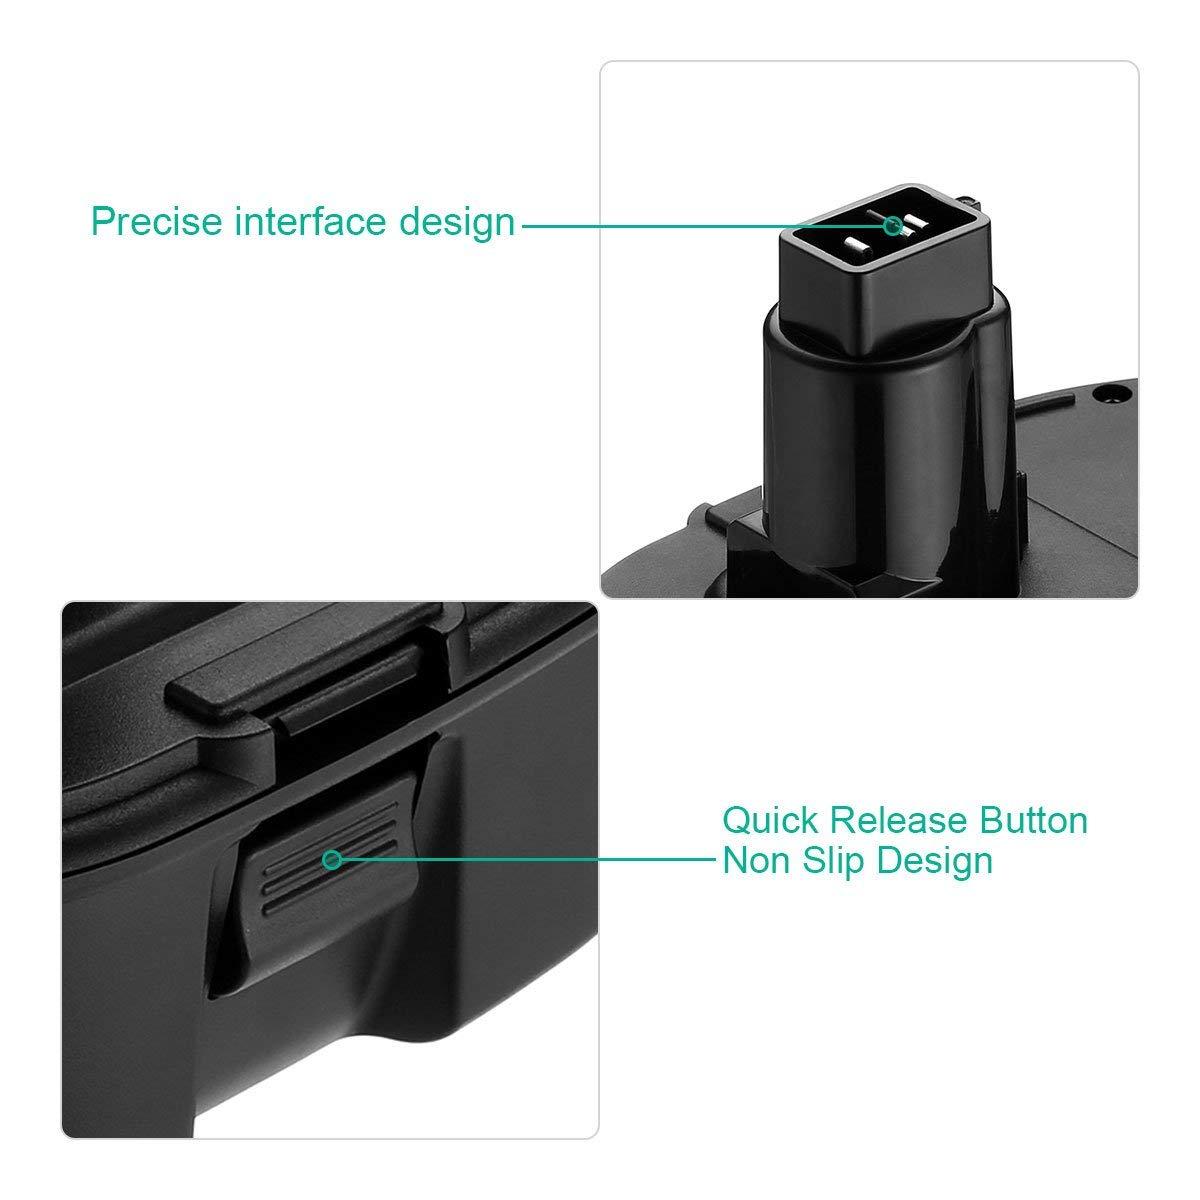 hight resolution of firstpower 18v replacement battery for dewalt dc9096 de9039 de9095 de9096 de9098 dw9095 dw9096 dw9098 de9503